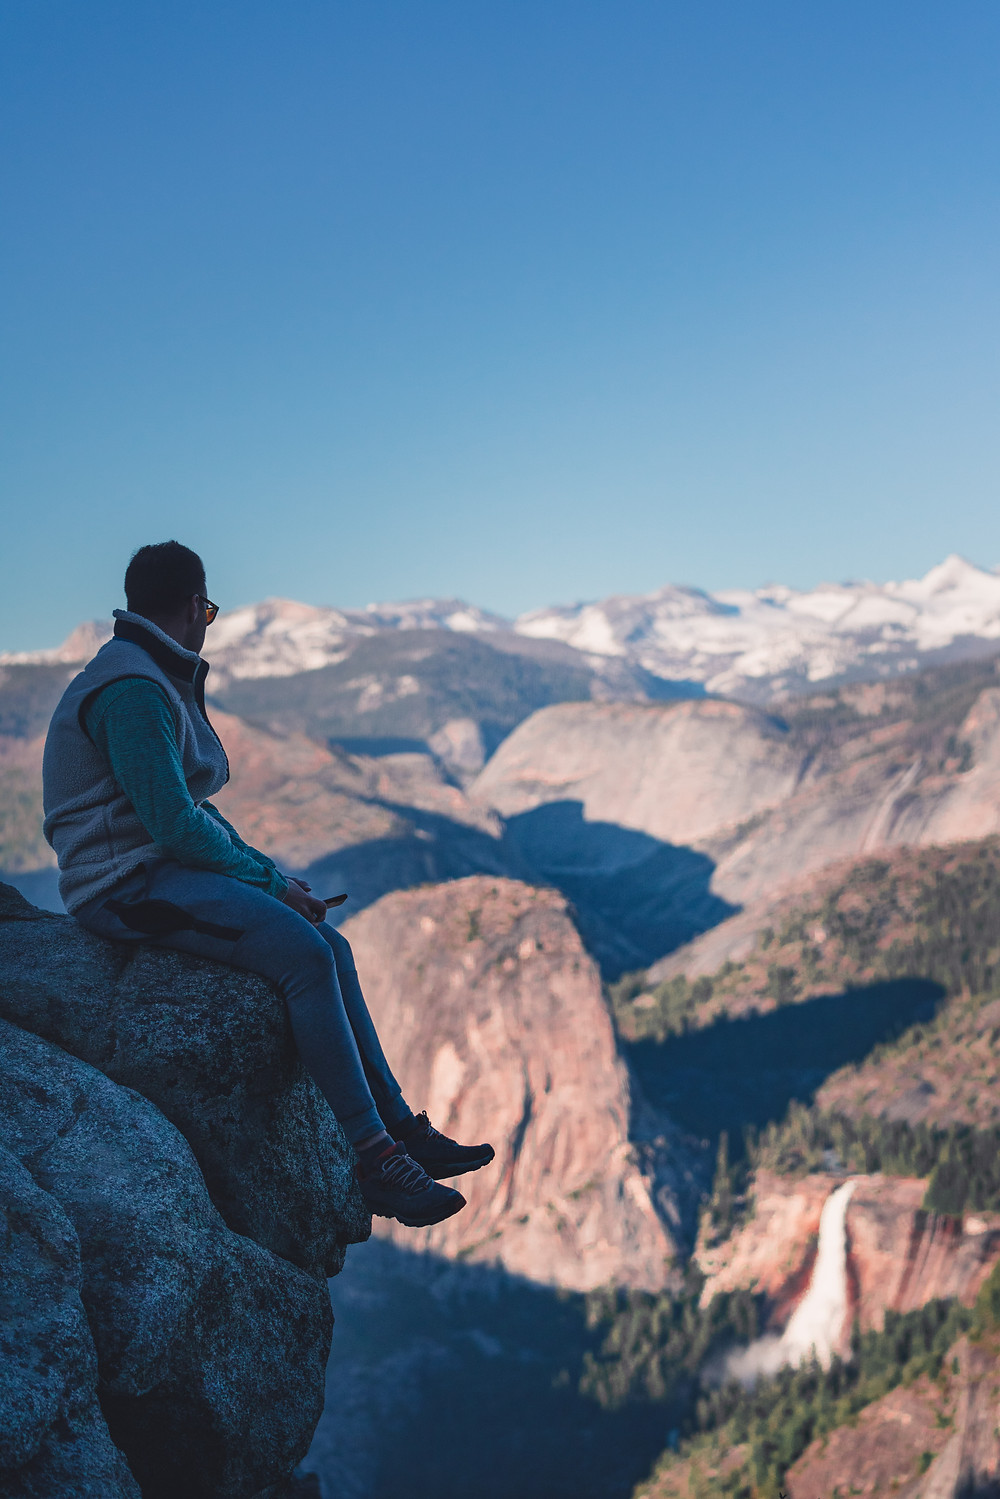 Yosemite National Park Views from Washburn Point